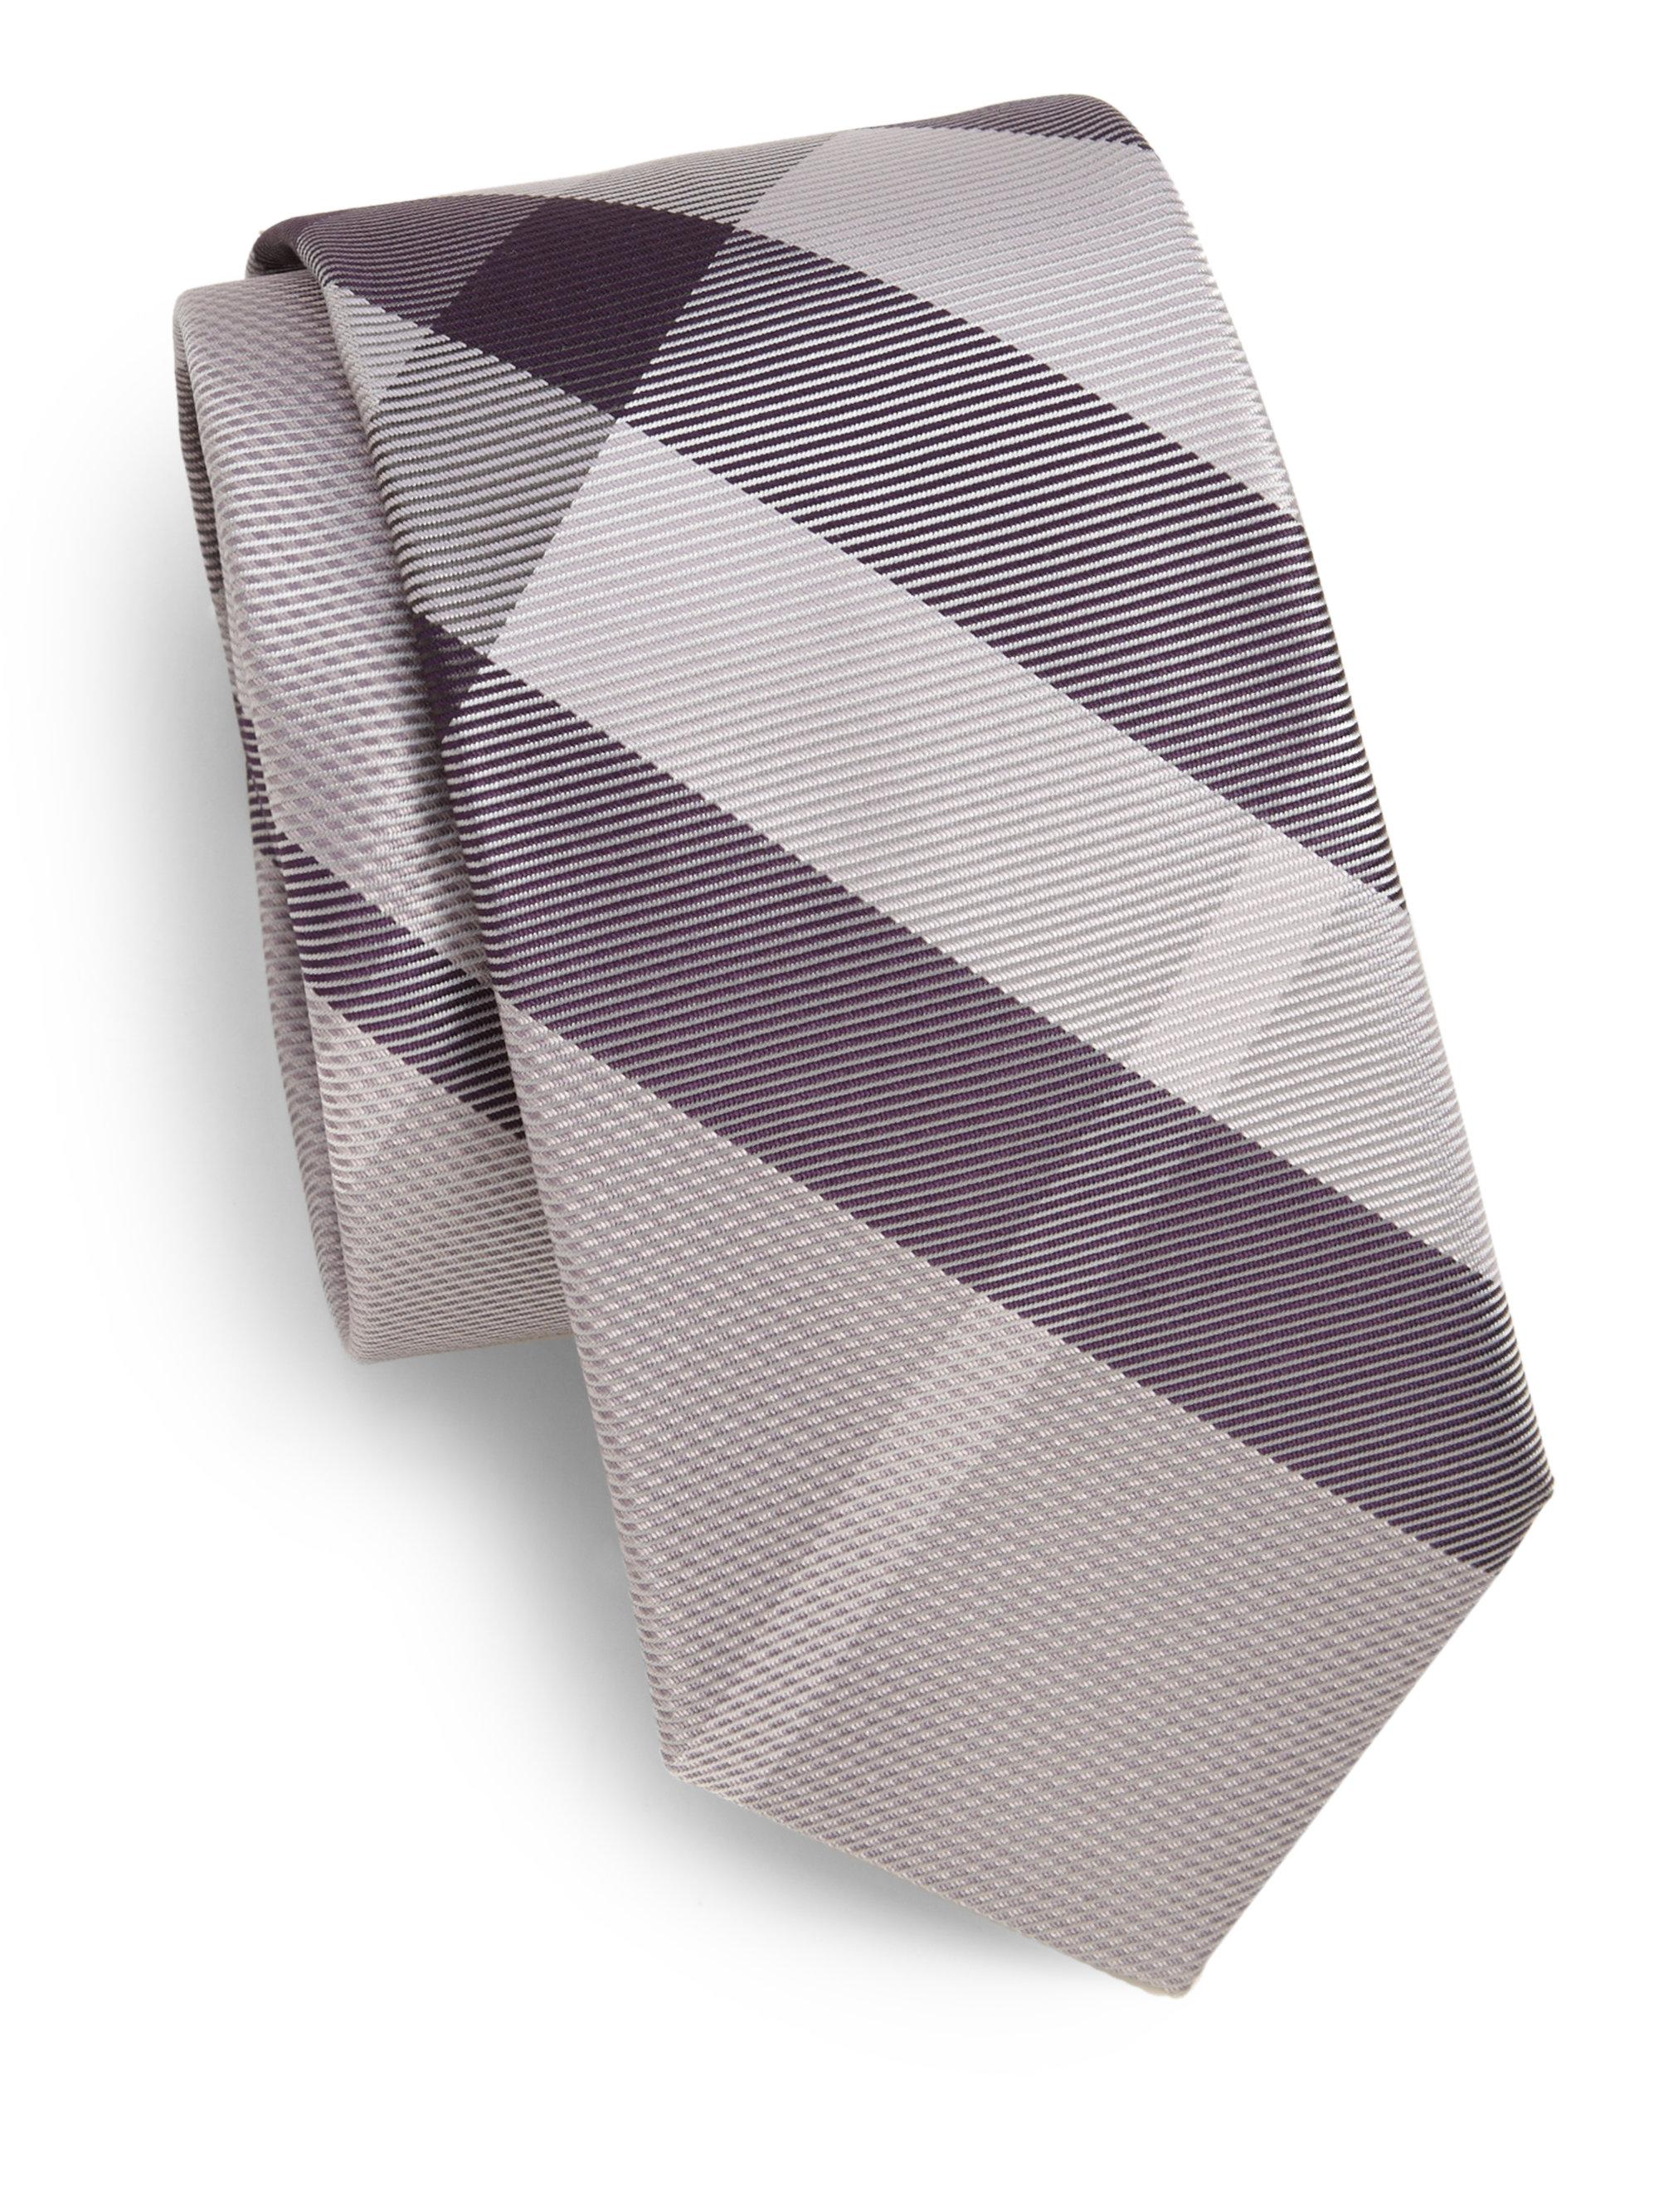 0da7a53d0045 ... denmark lyst burberry striped checkprint silk tie in purple for men  07483 c3c97